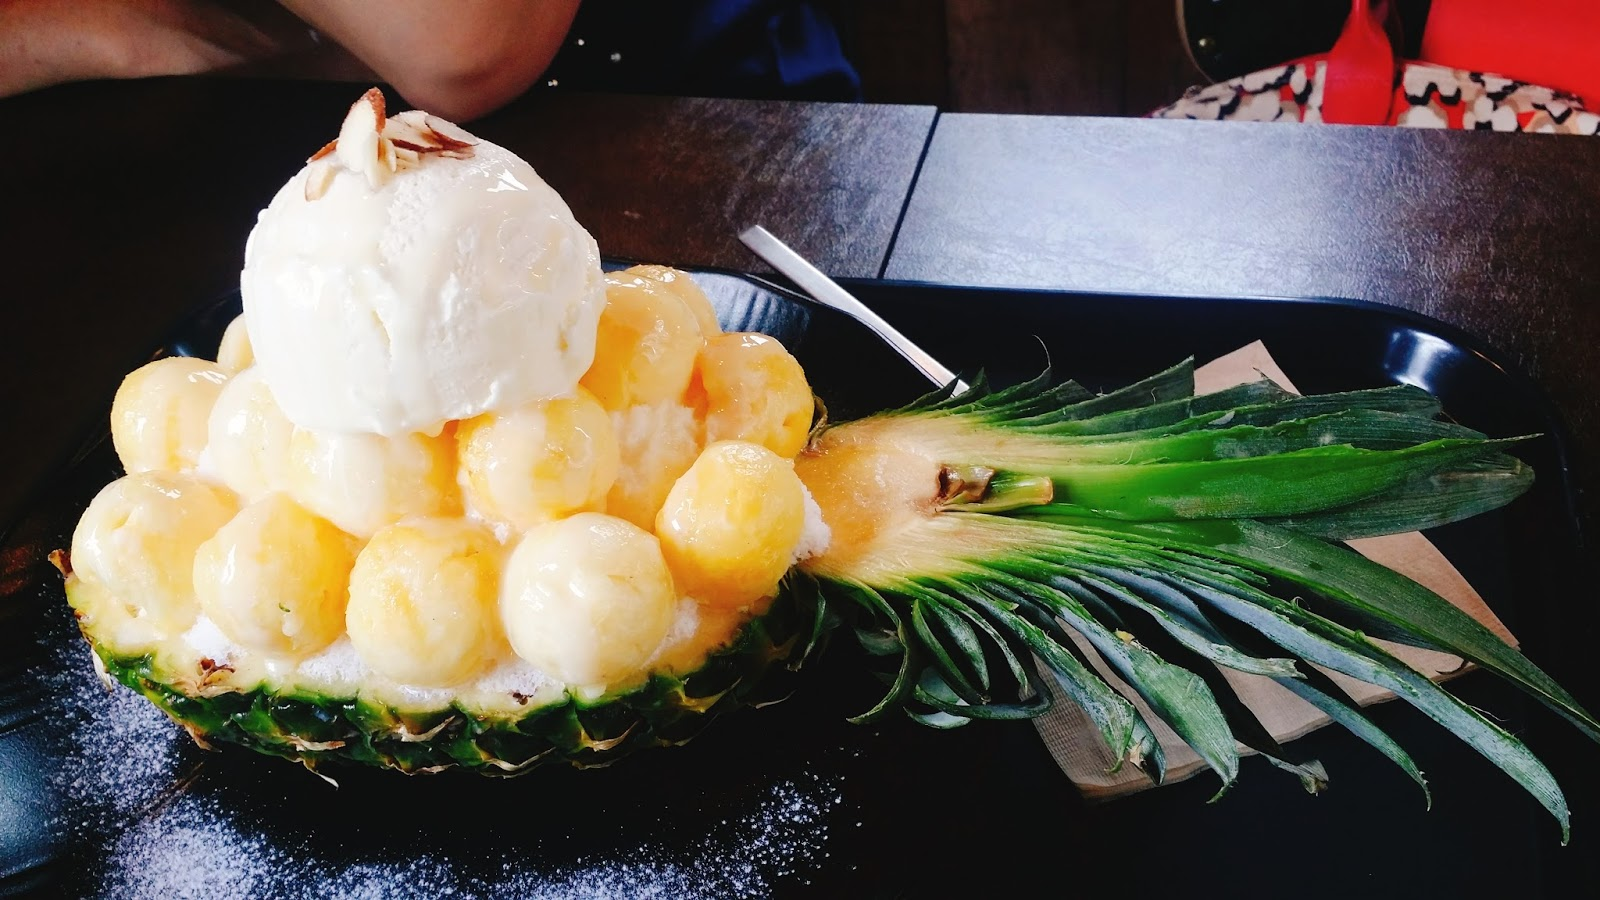 Korean Summer Dessert Bingsu That Will Make You Want To Travel To